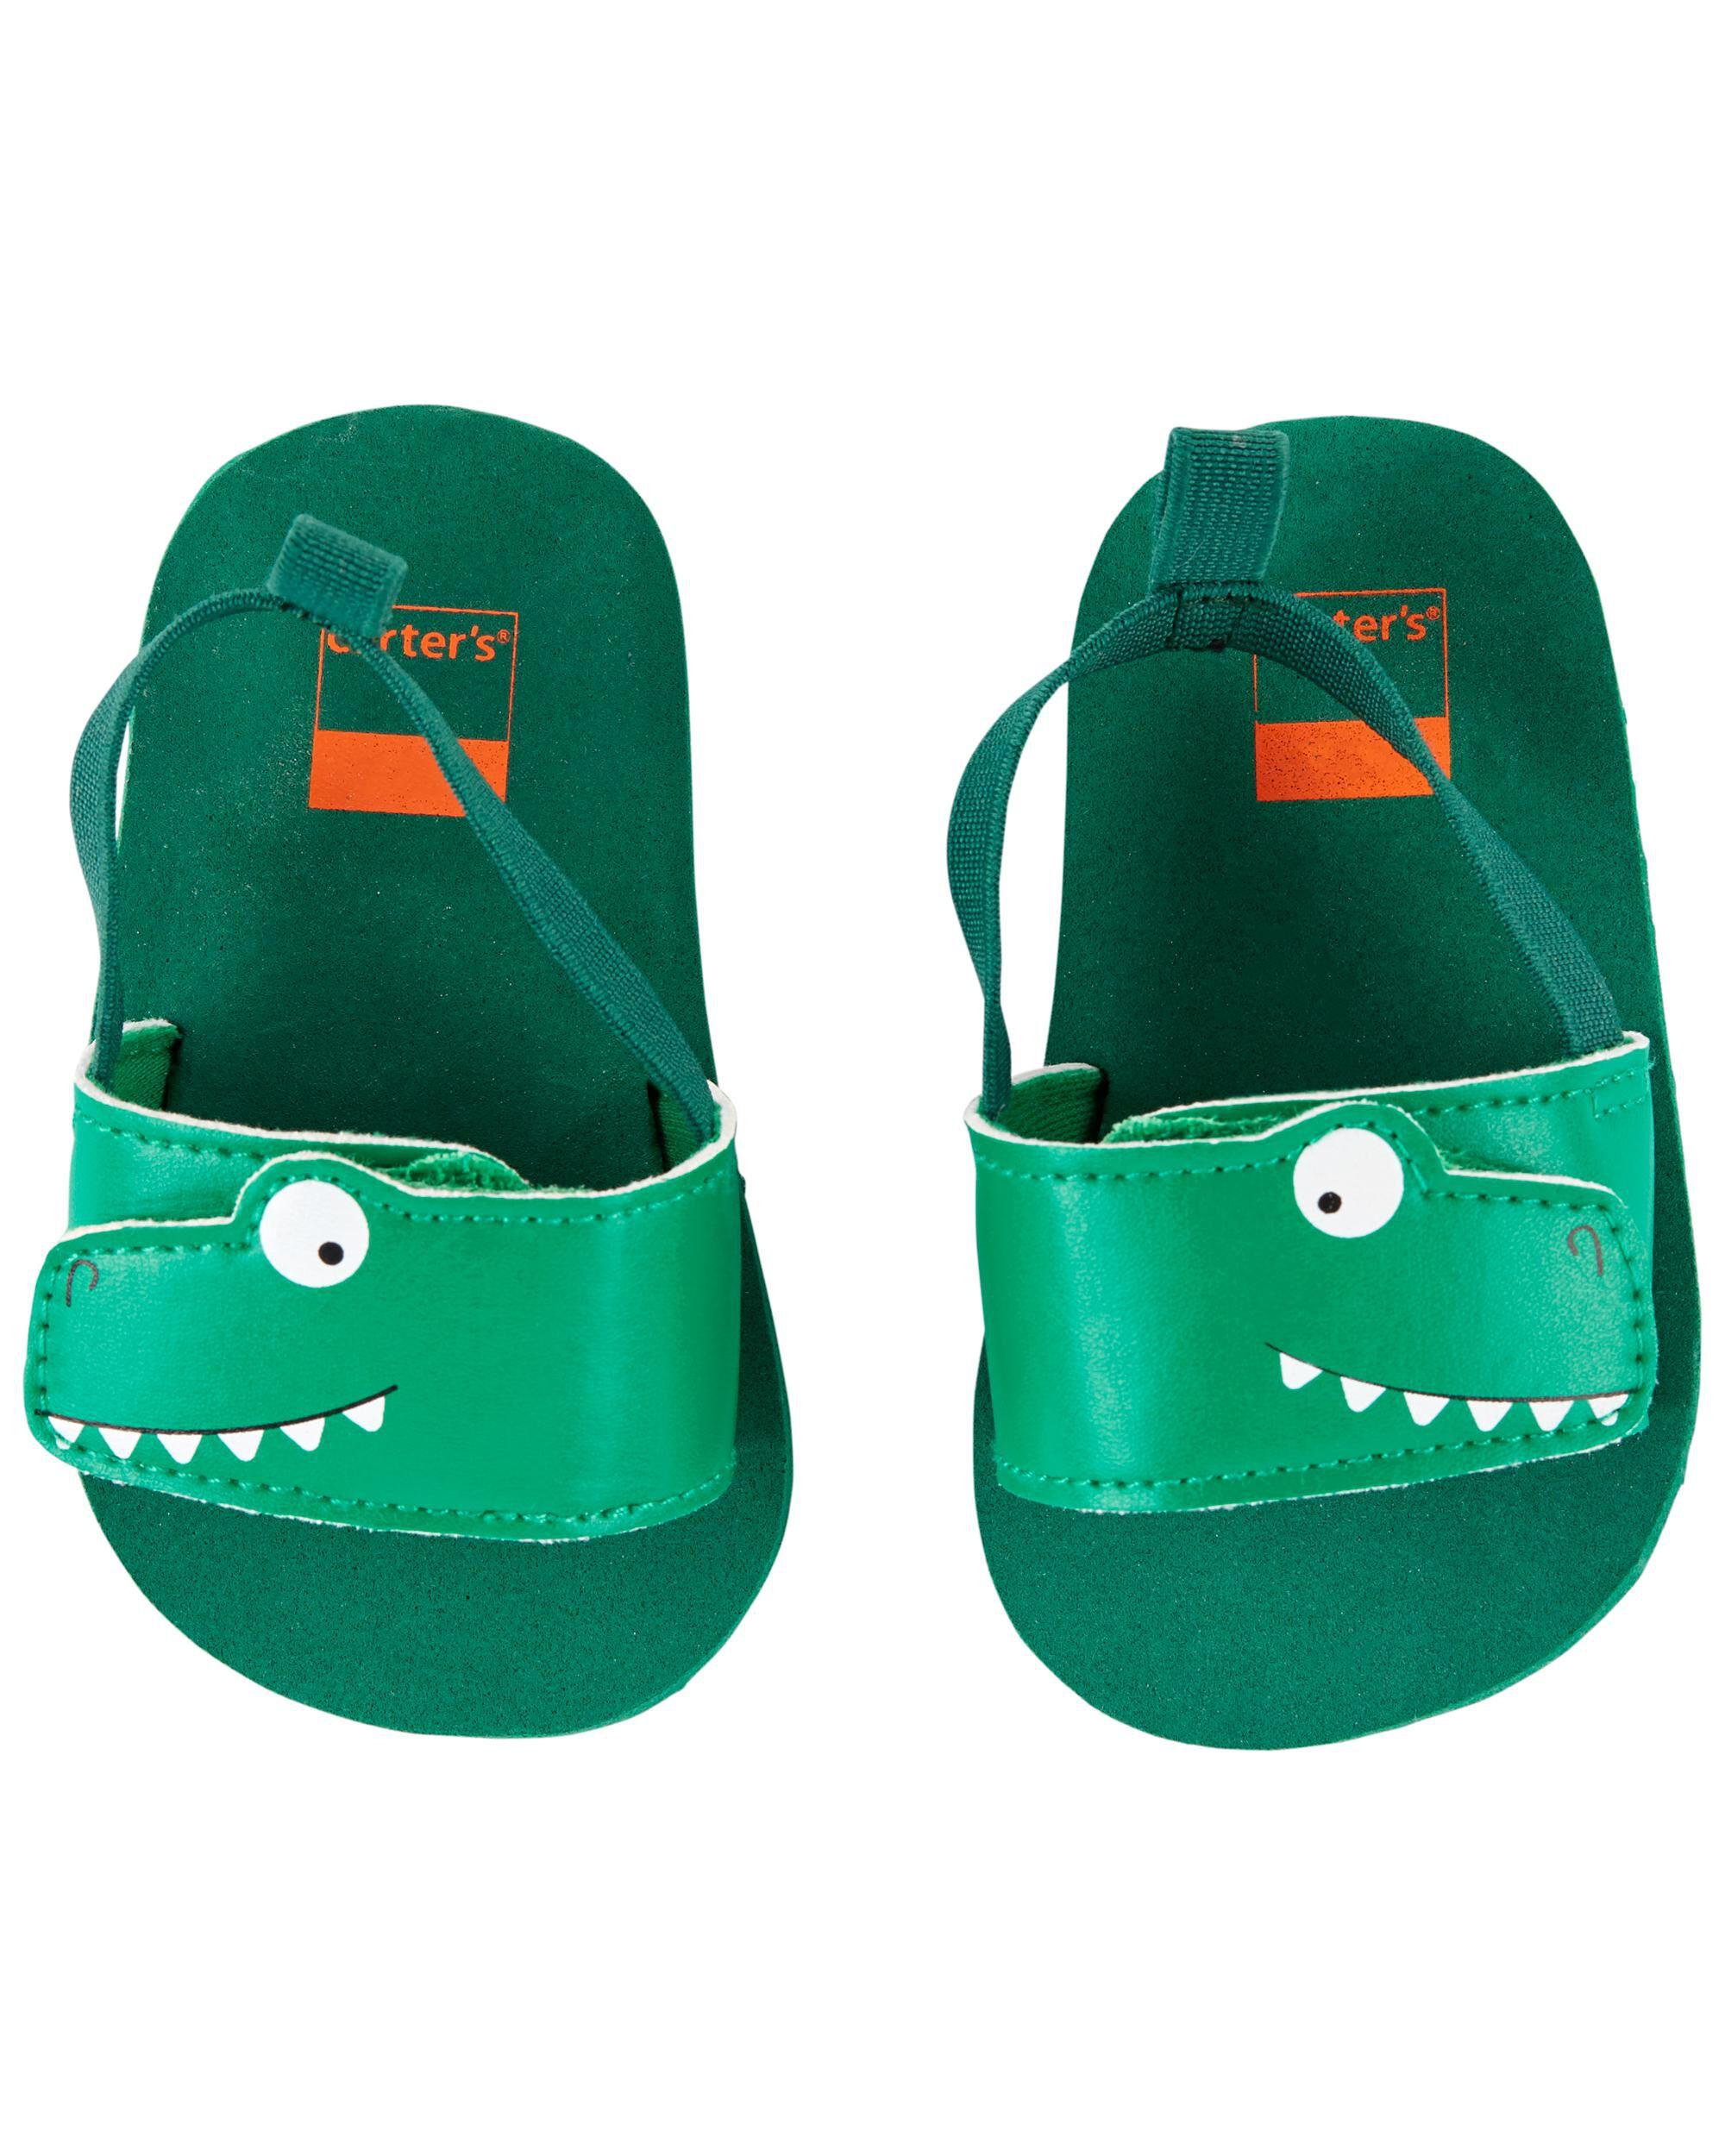 Carters Dinosaur Slides